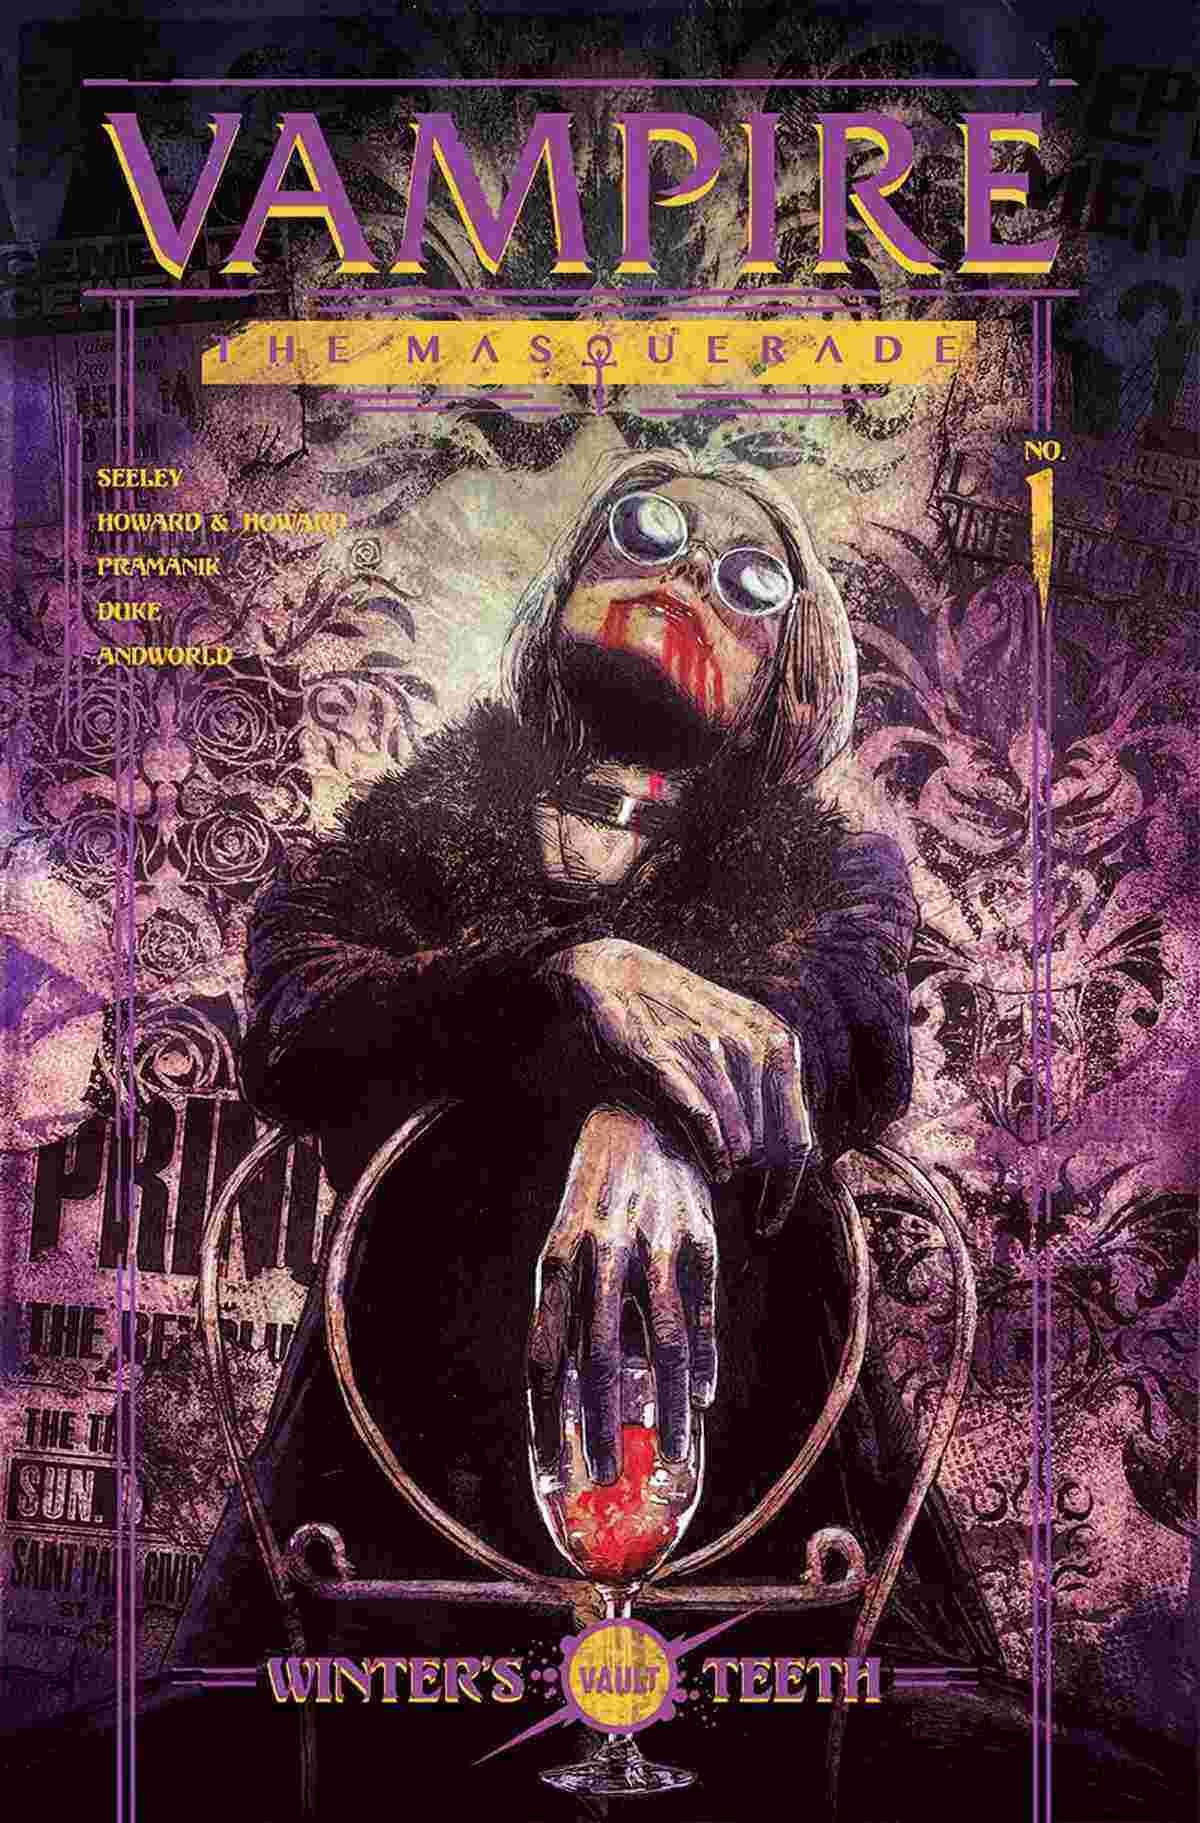 Vampire the Masquerade #1